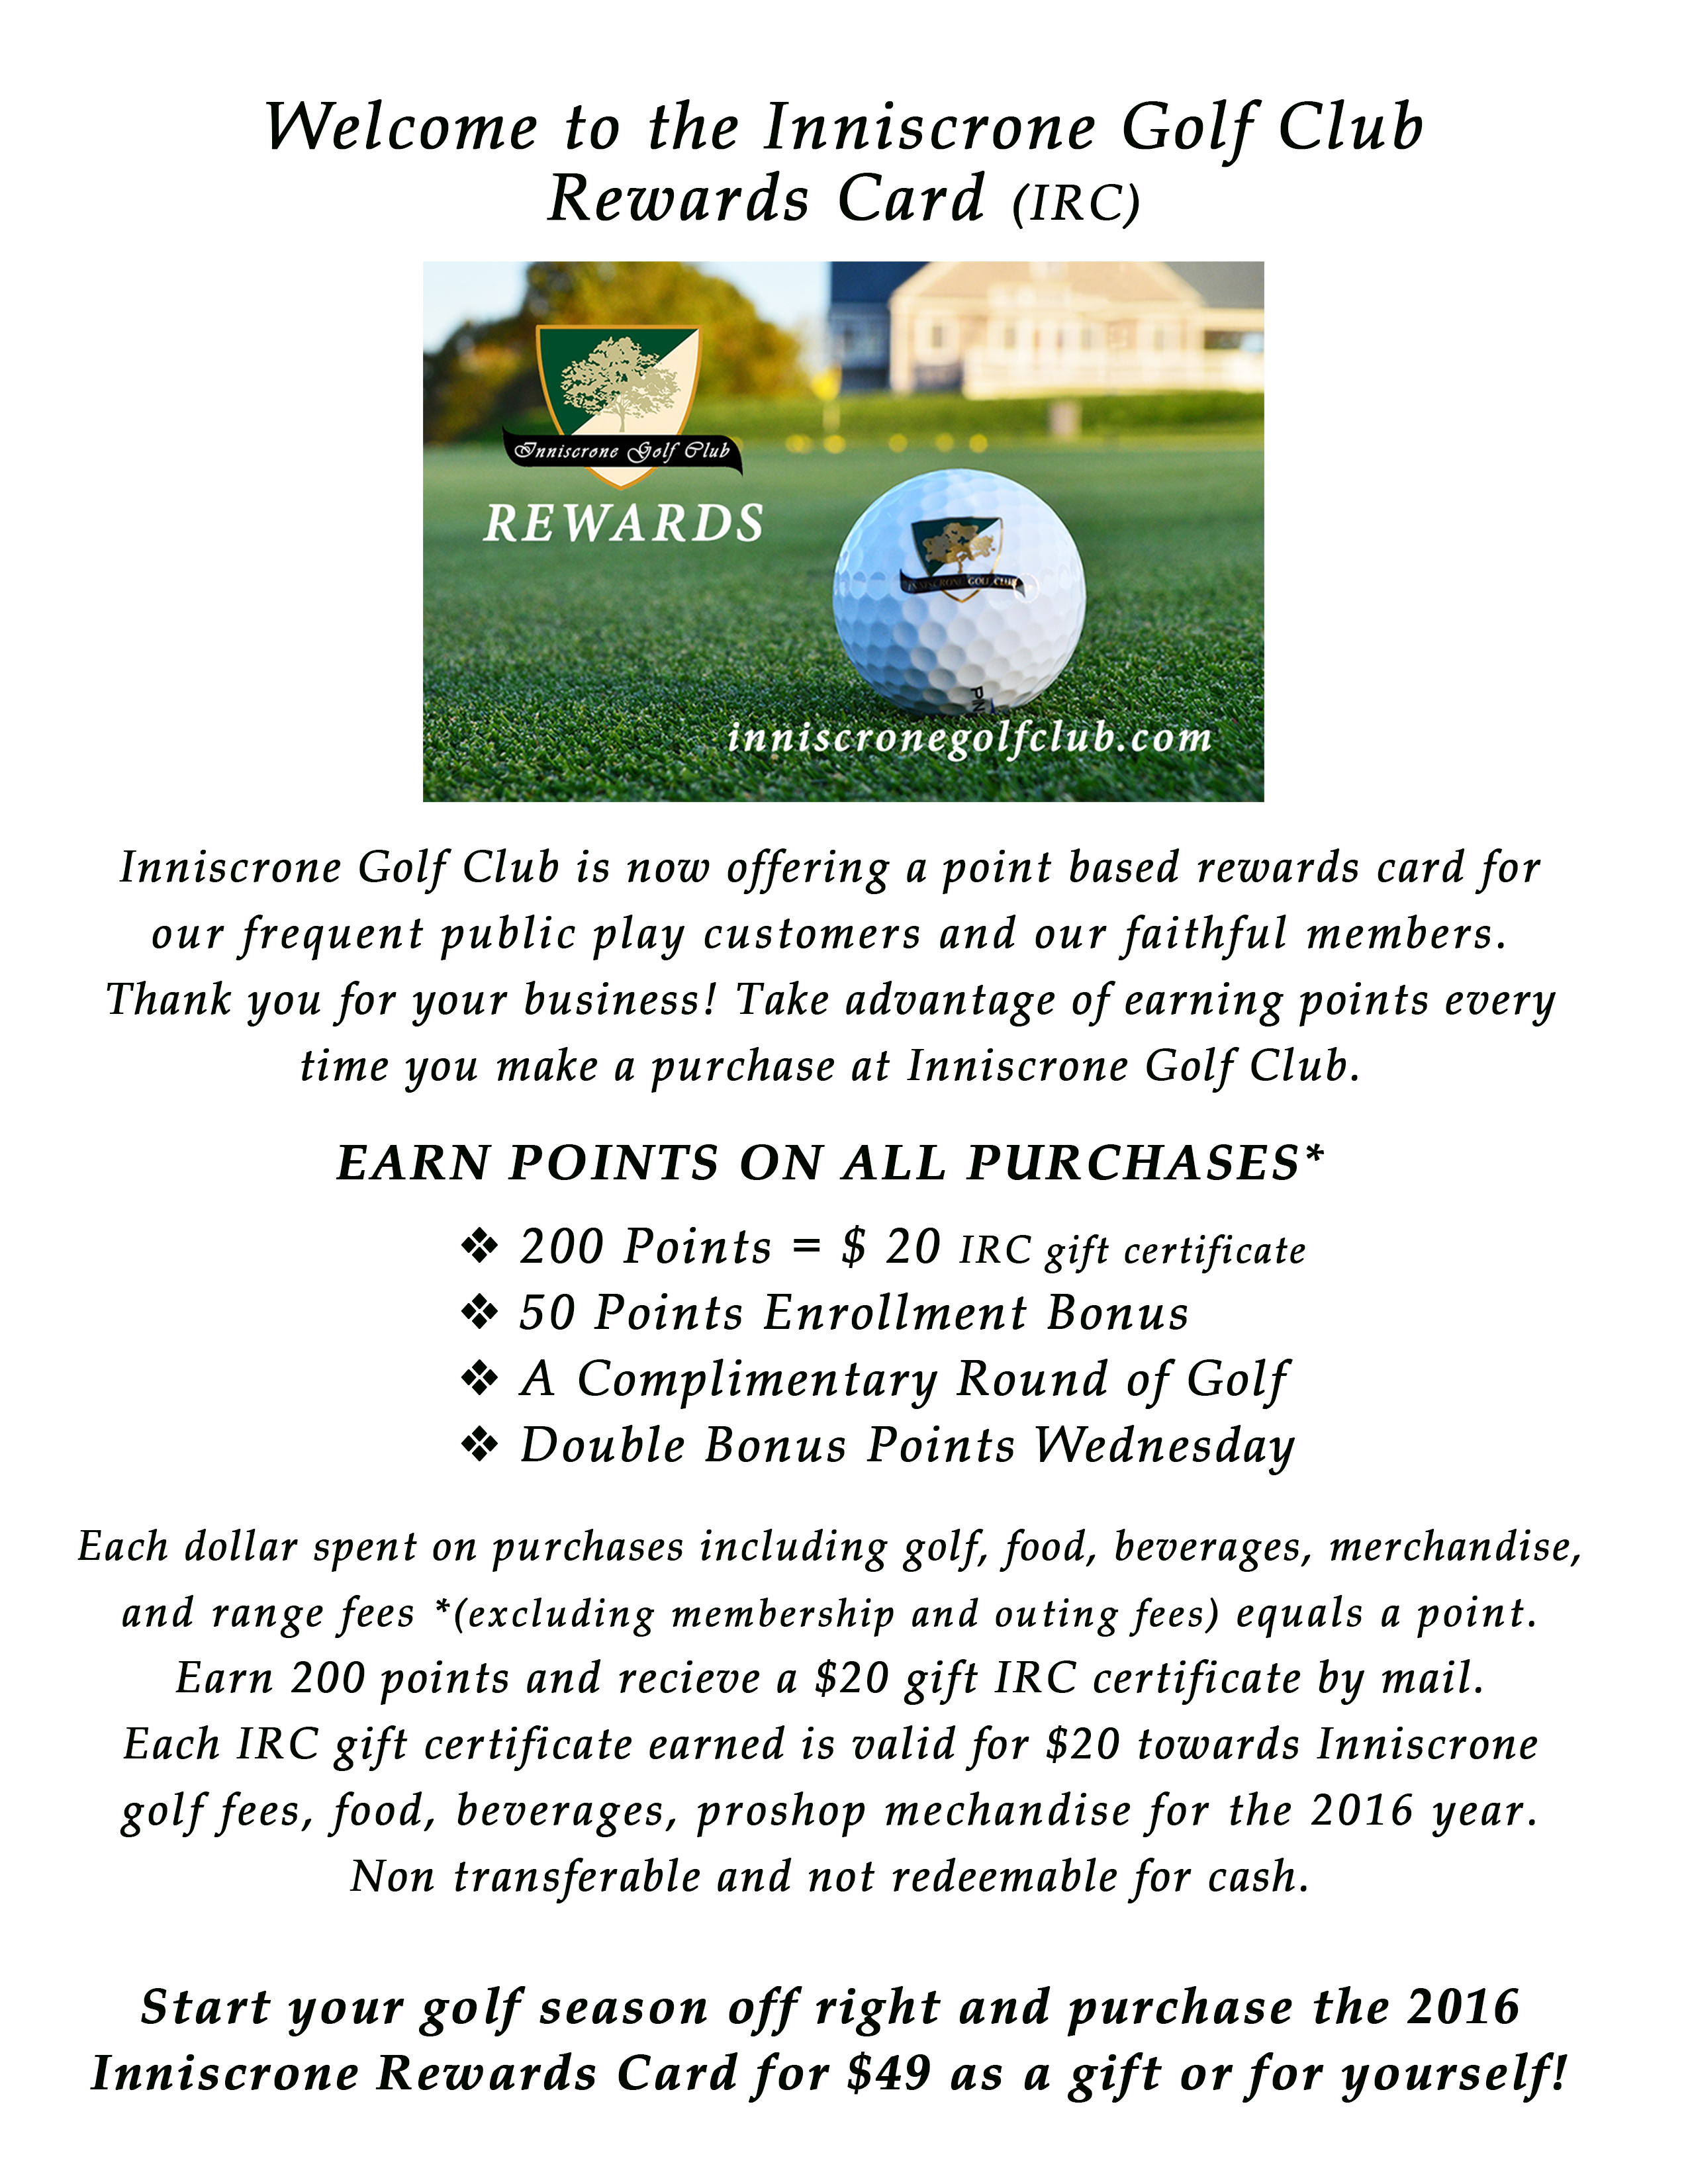 Rewards Card info page